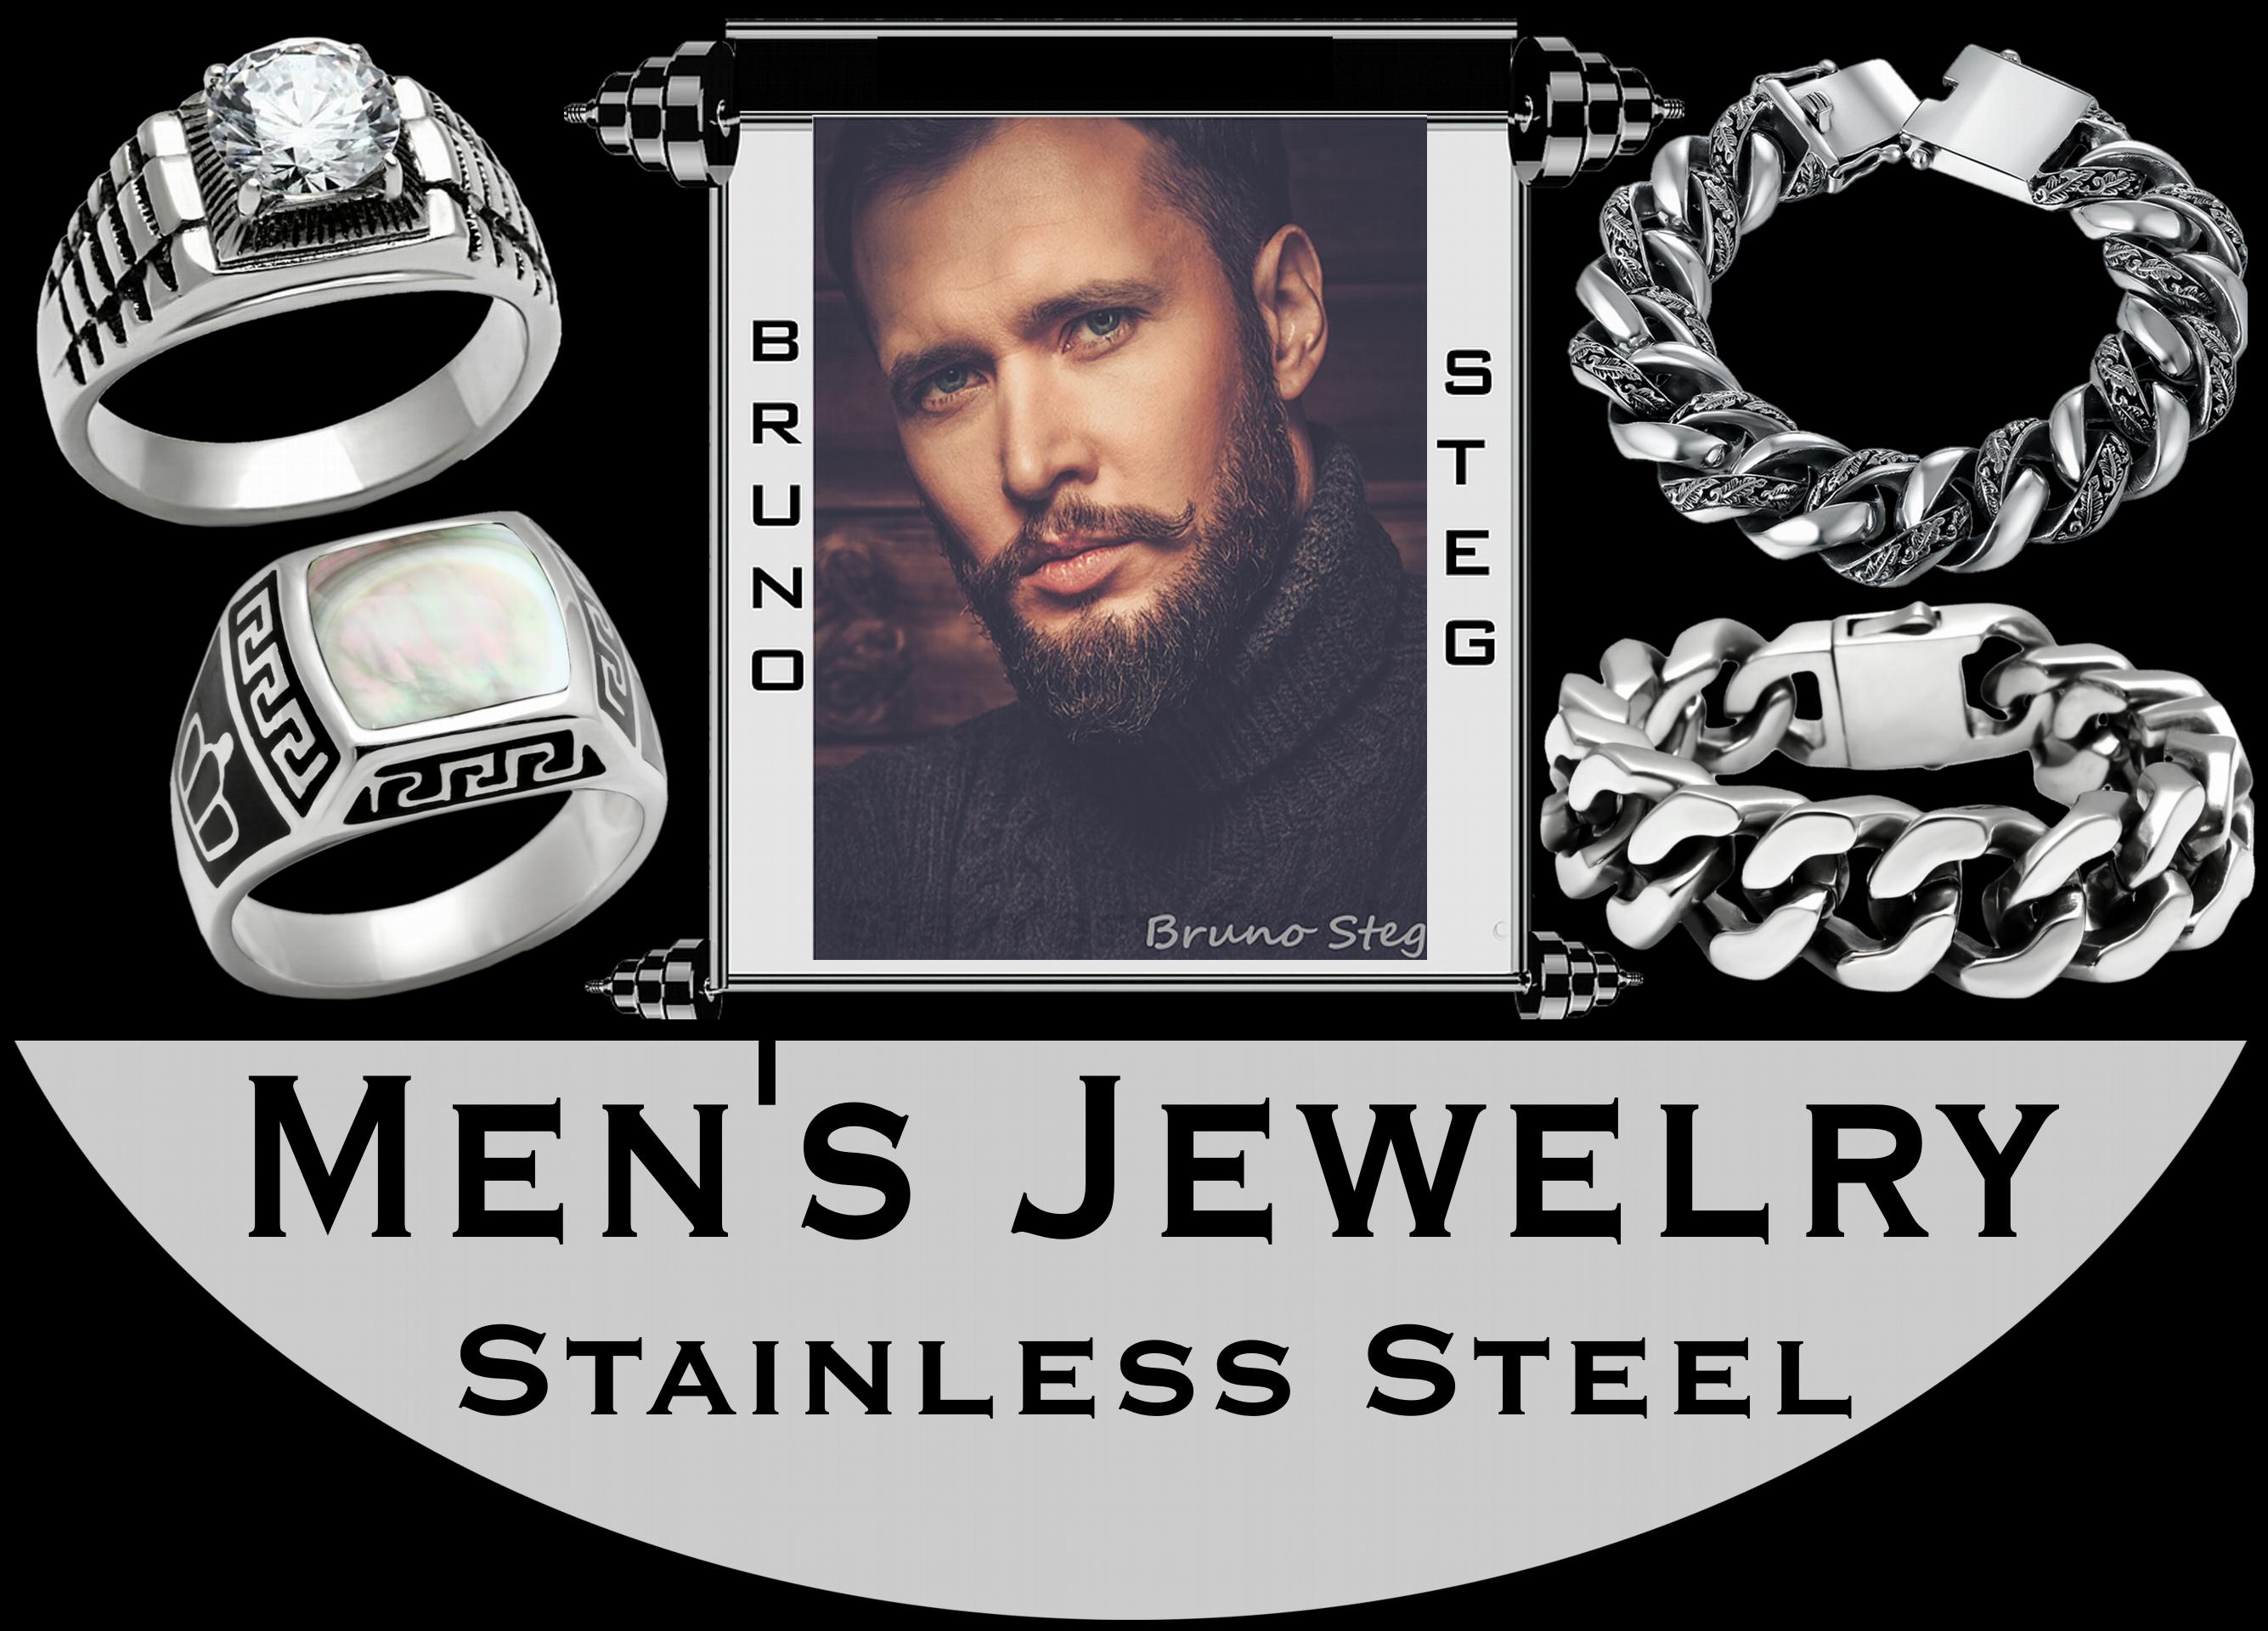 https://www.realimpostersjewelry.com/mens-stainless-steel-jewelry